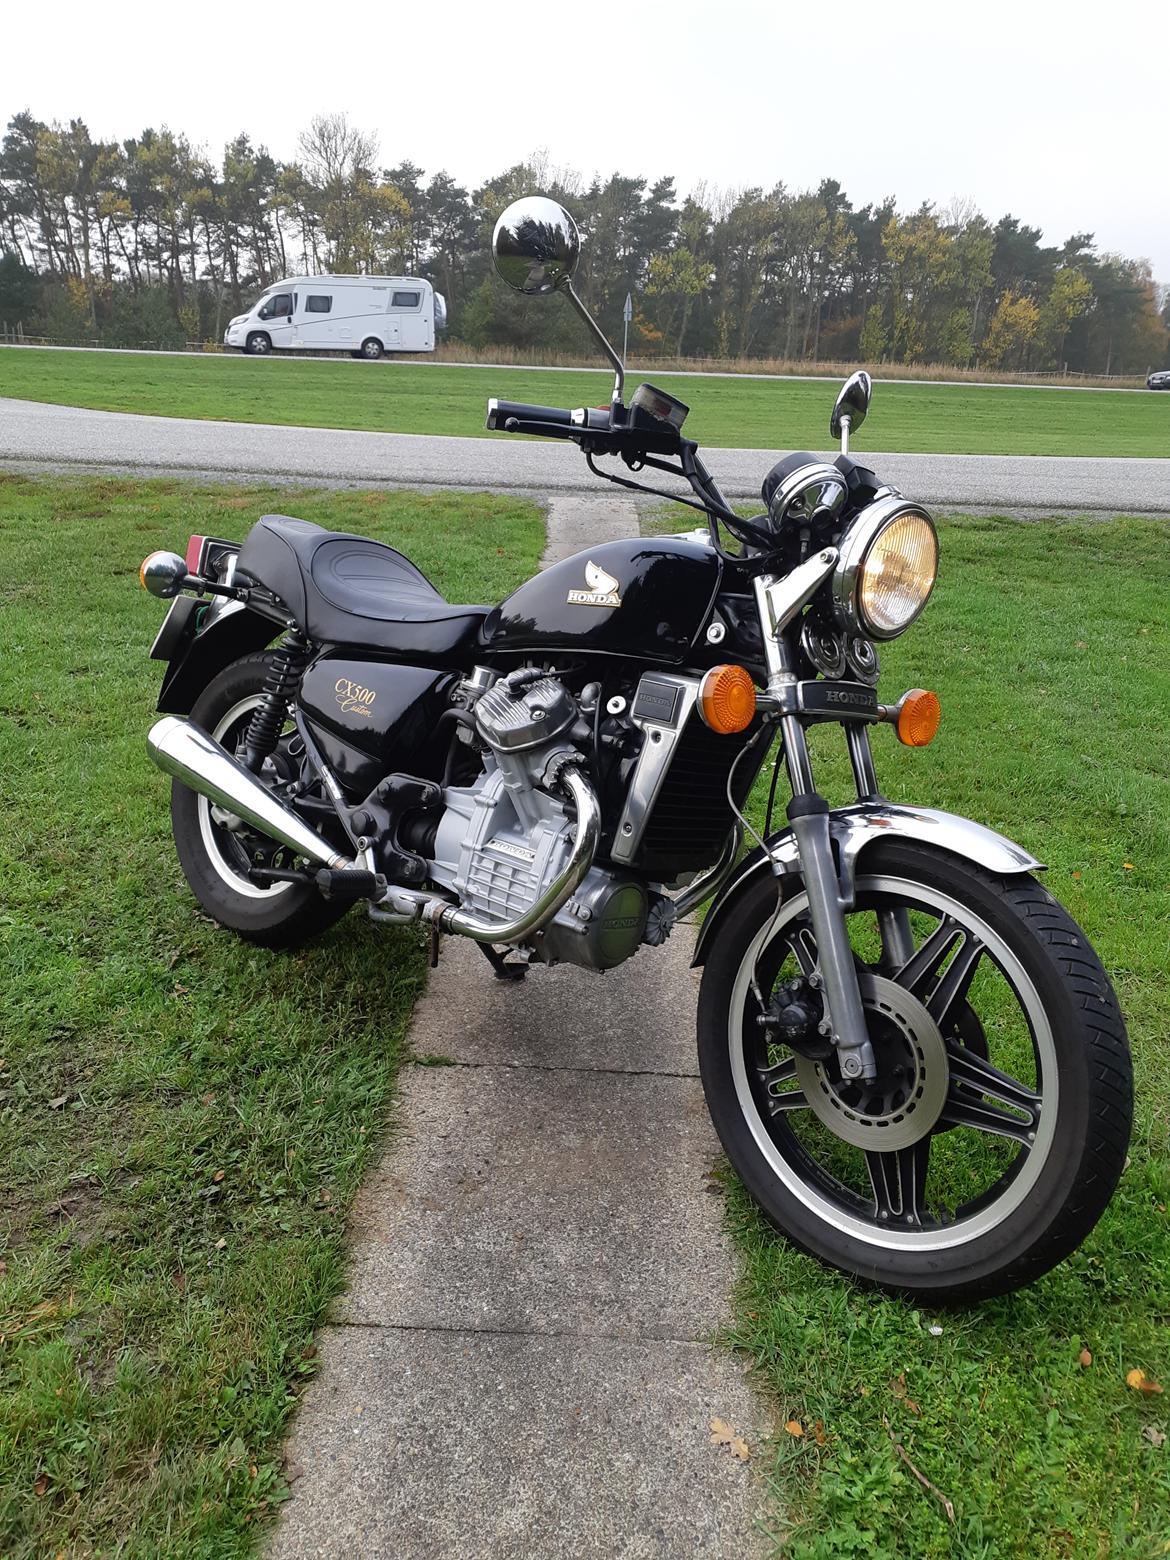 Honda cx 500 c billede 2